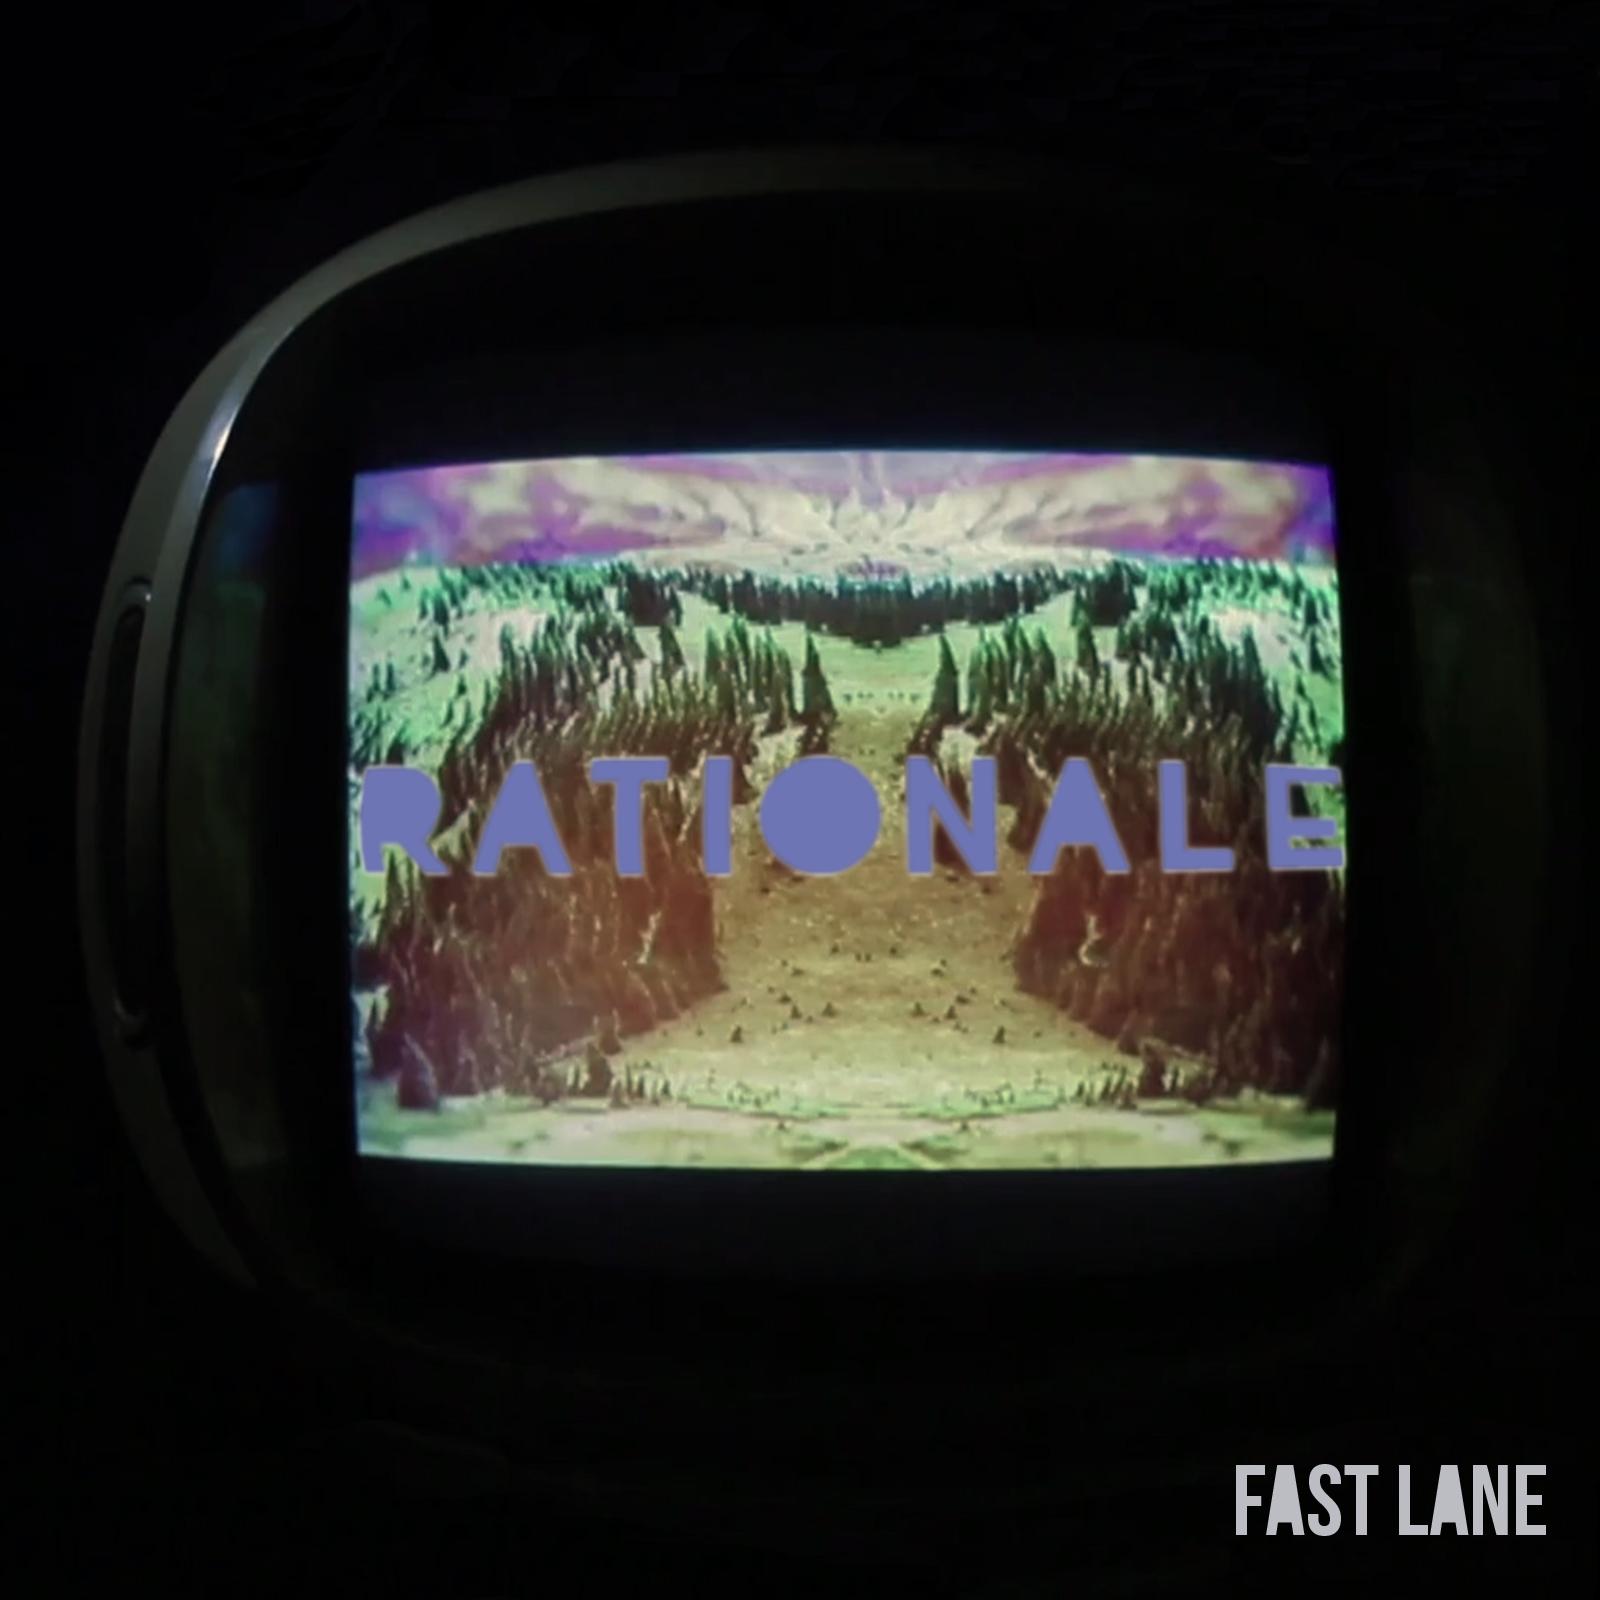 Rationale - Fast Lane